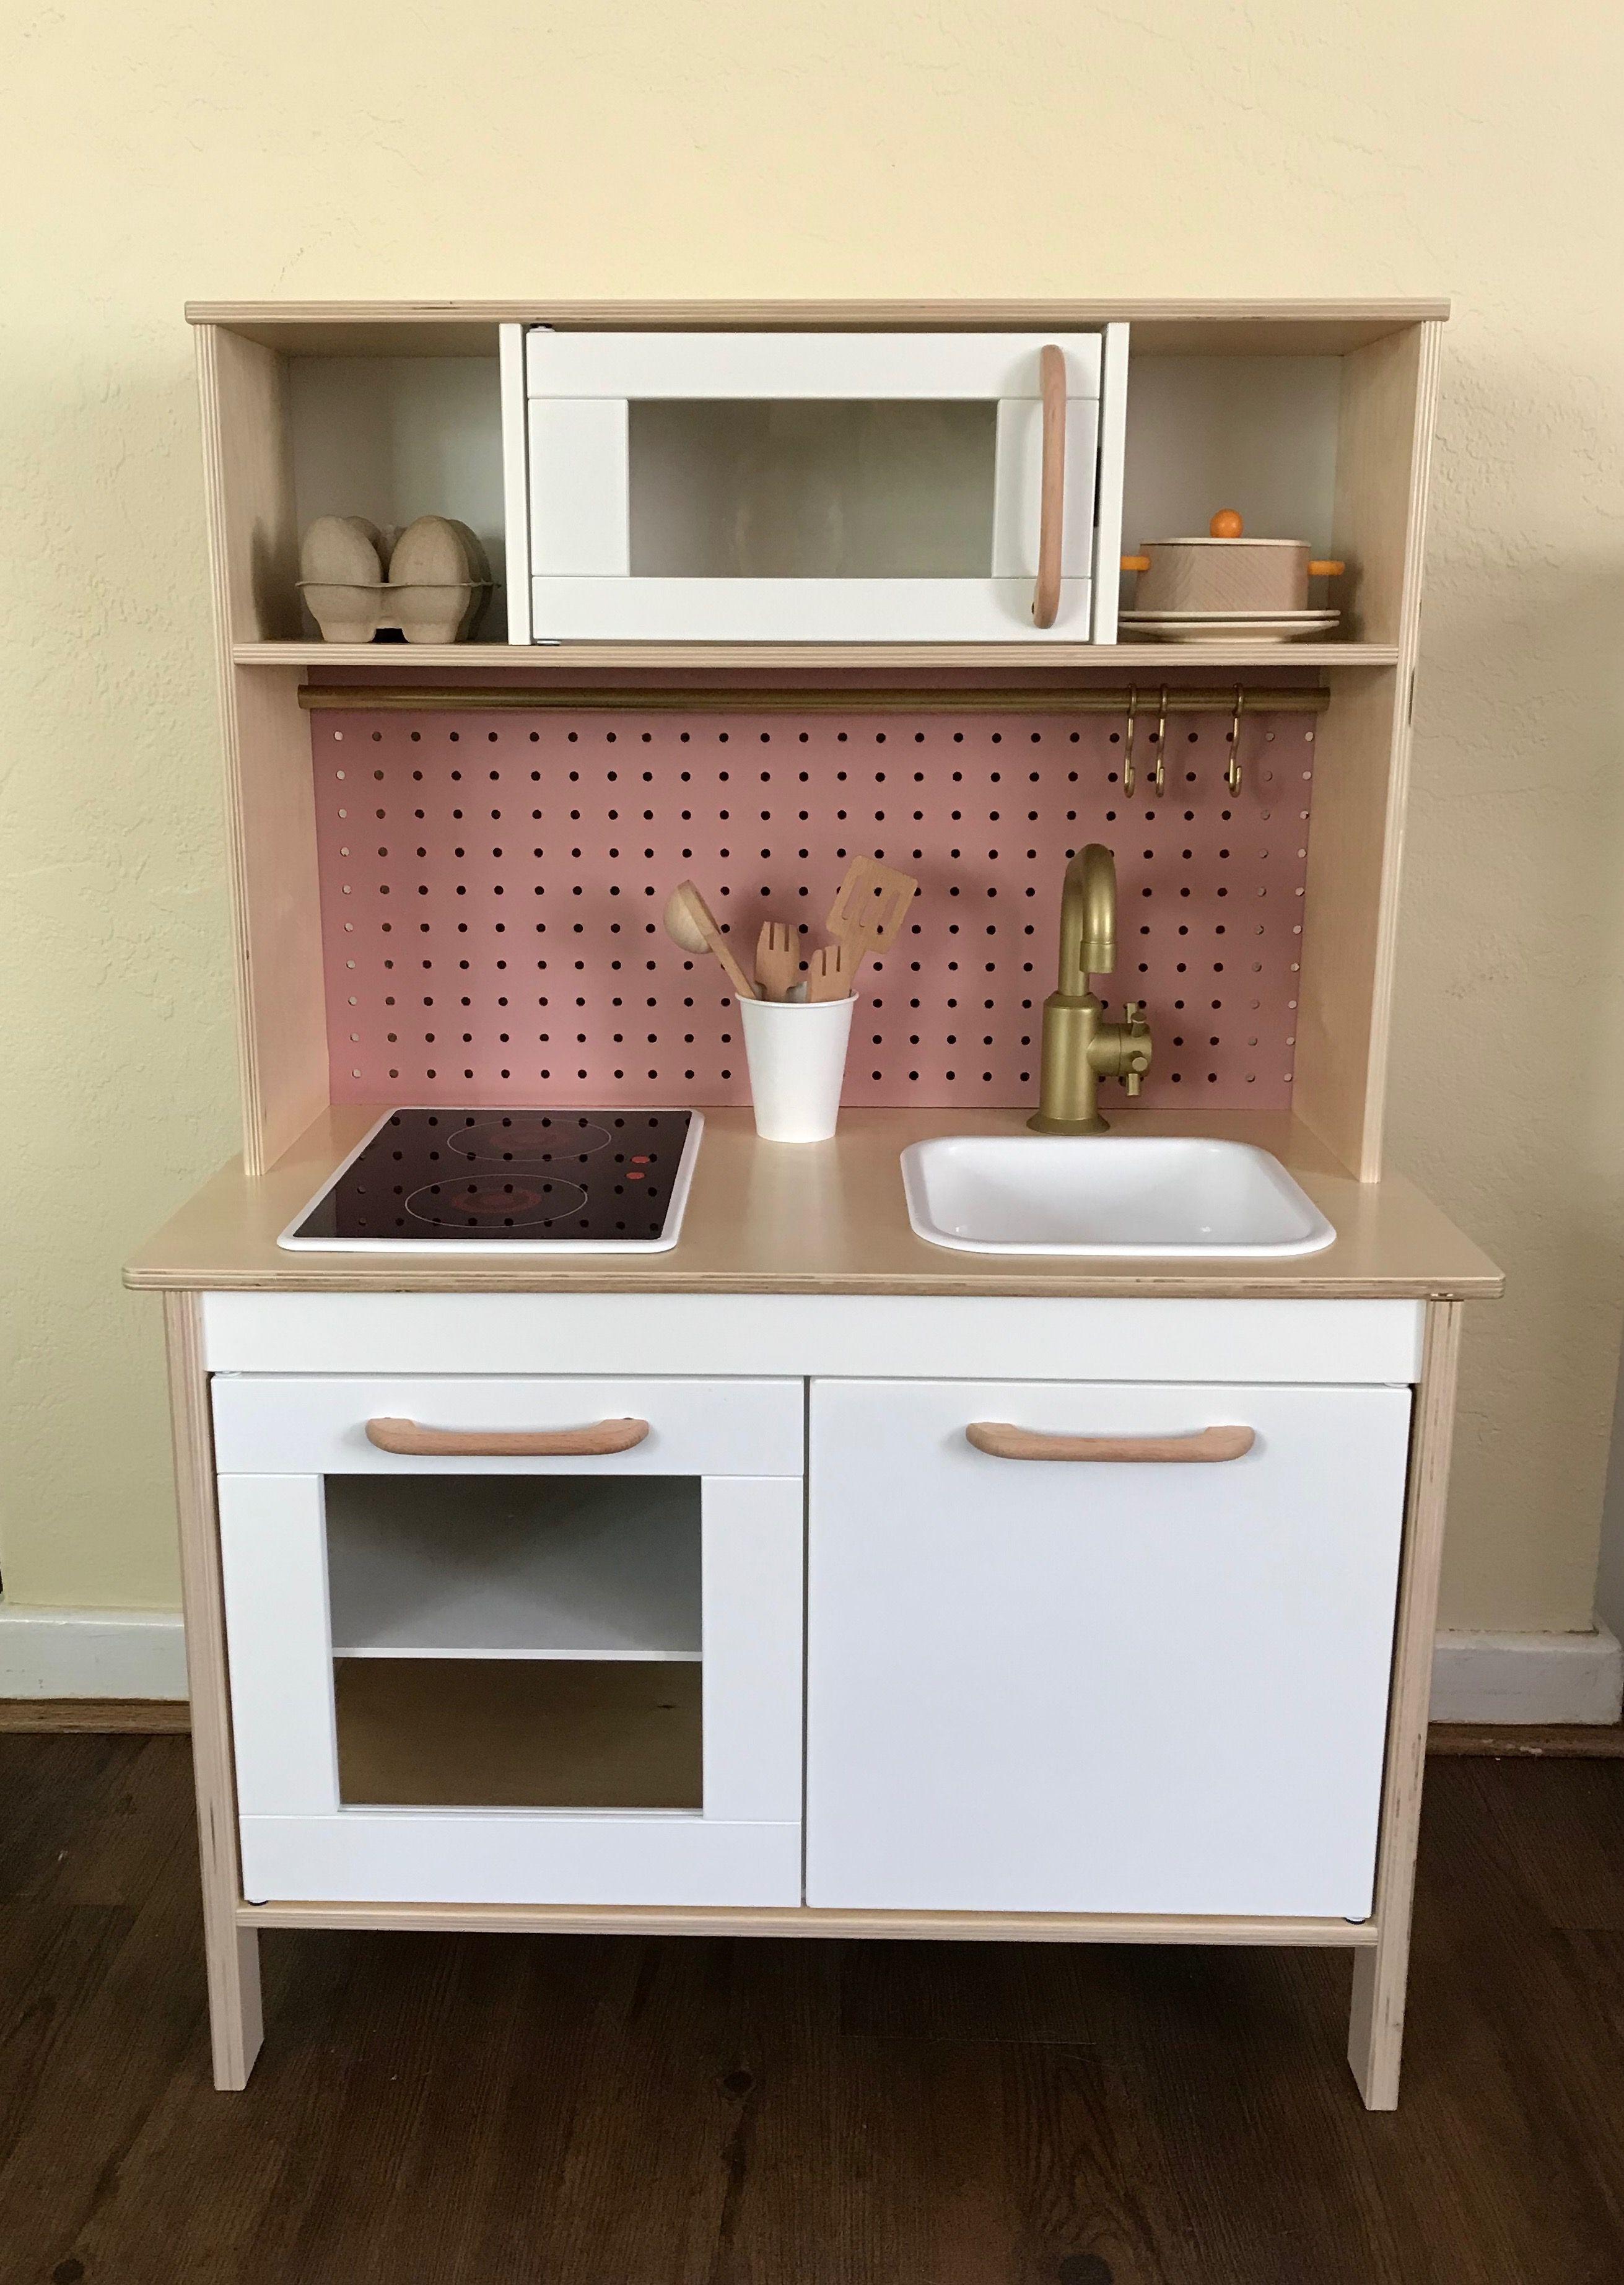 Ikea Duktig Play Kitchen Makeover By Dori Diy Pegboard Backsplash